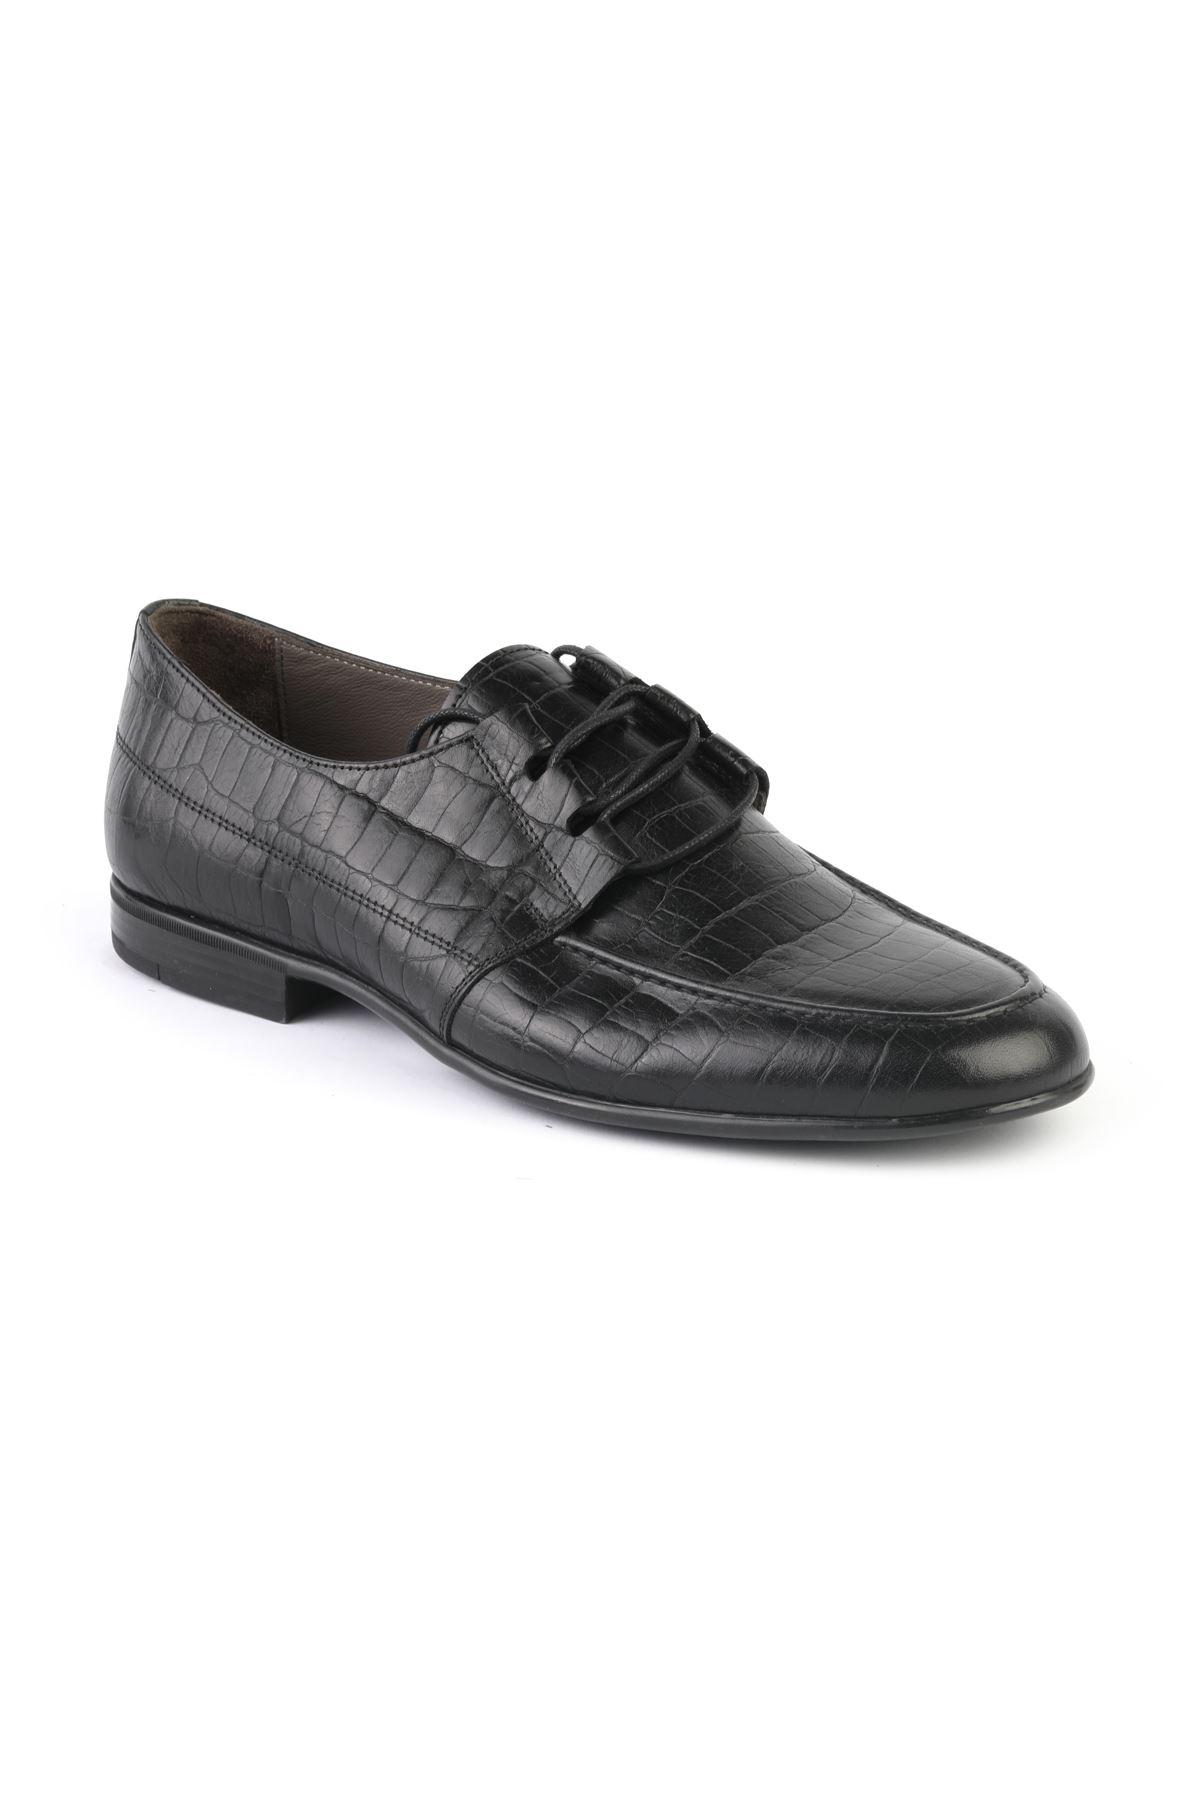 Libero T1139 Black Classic Shoes